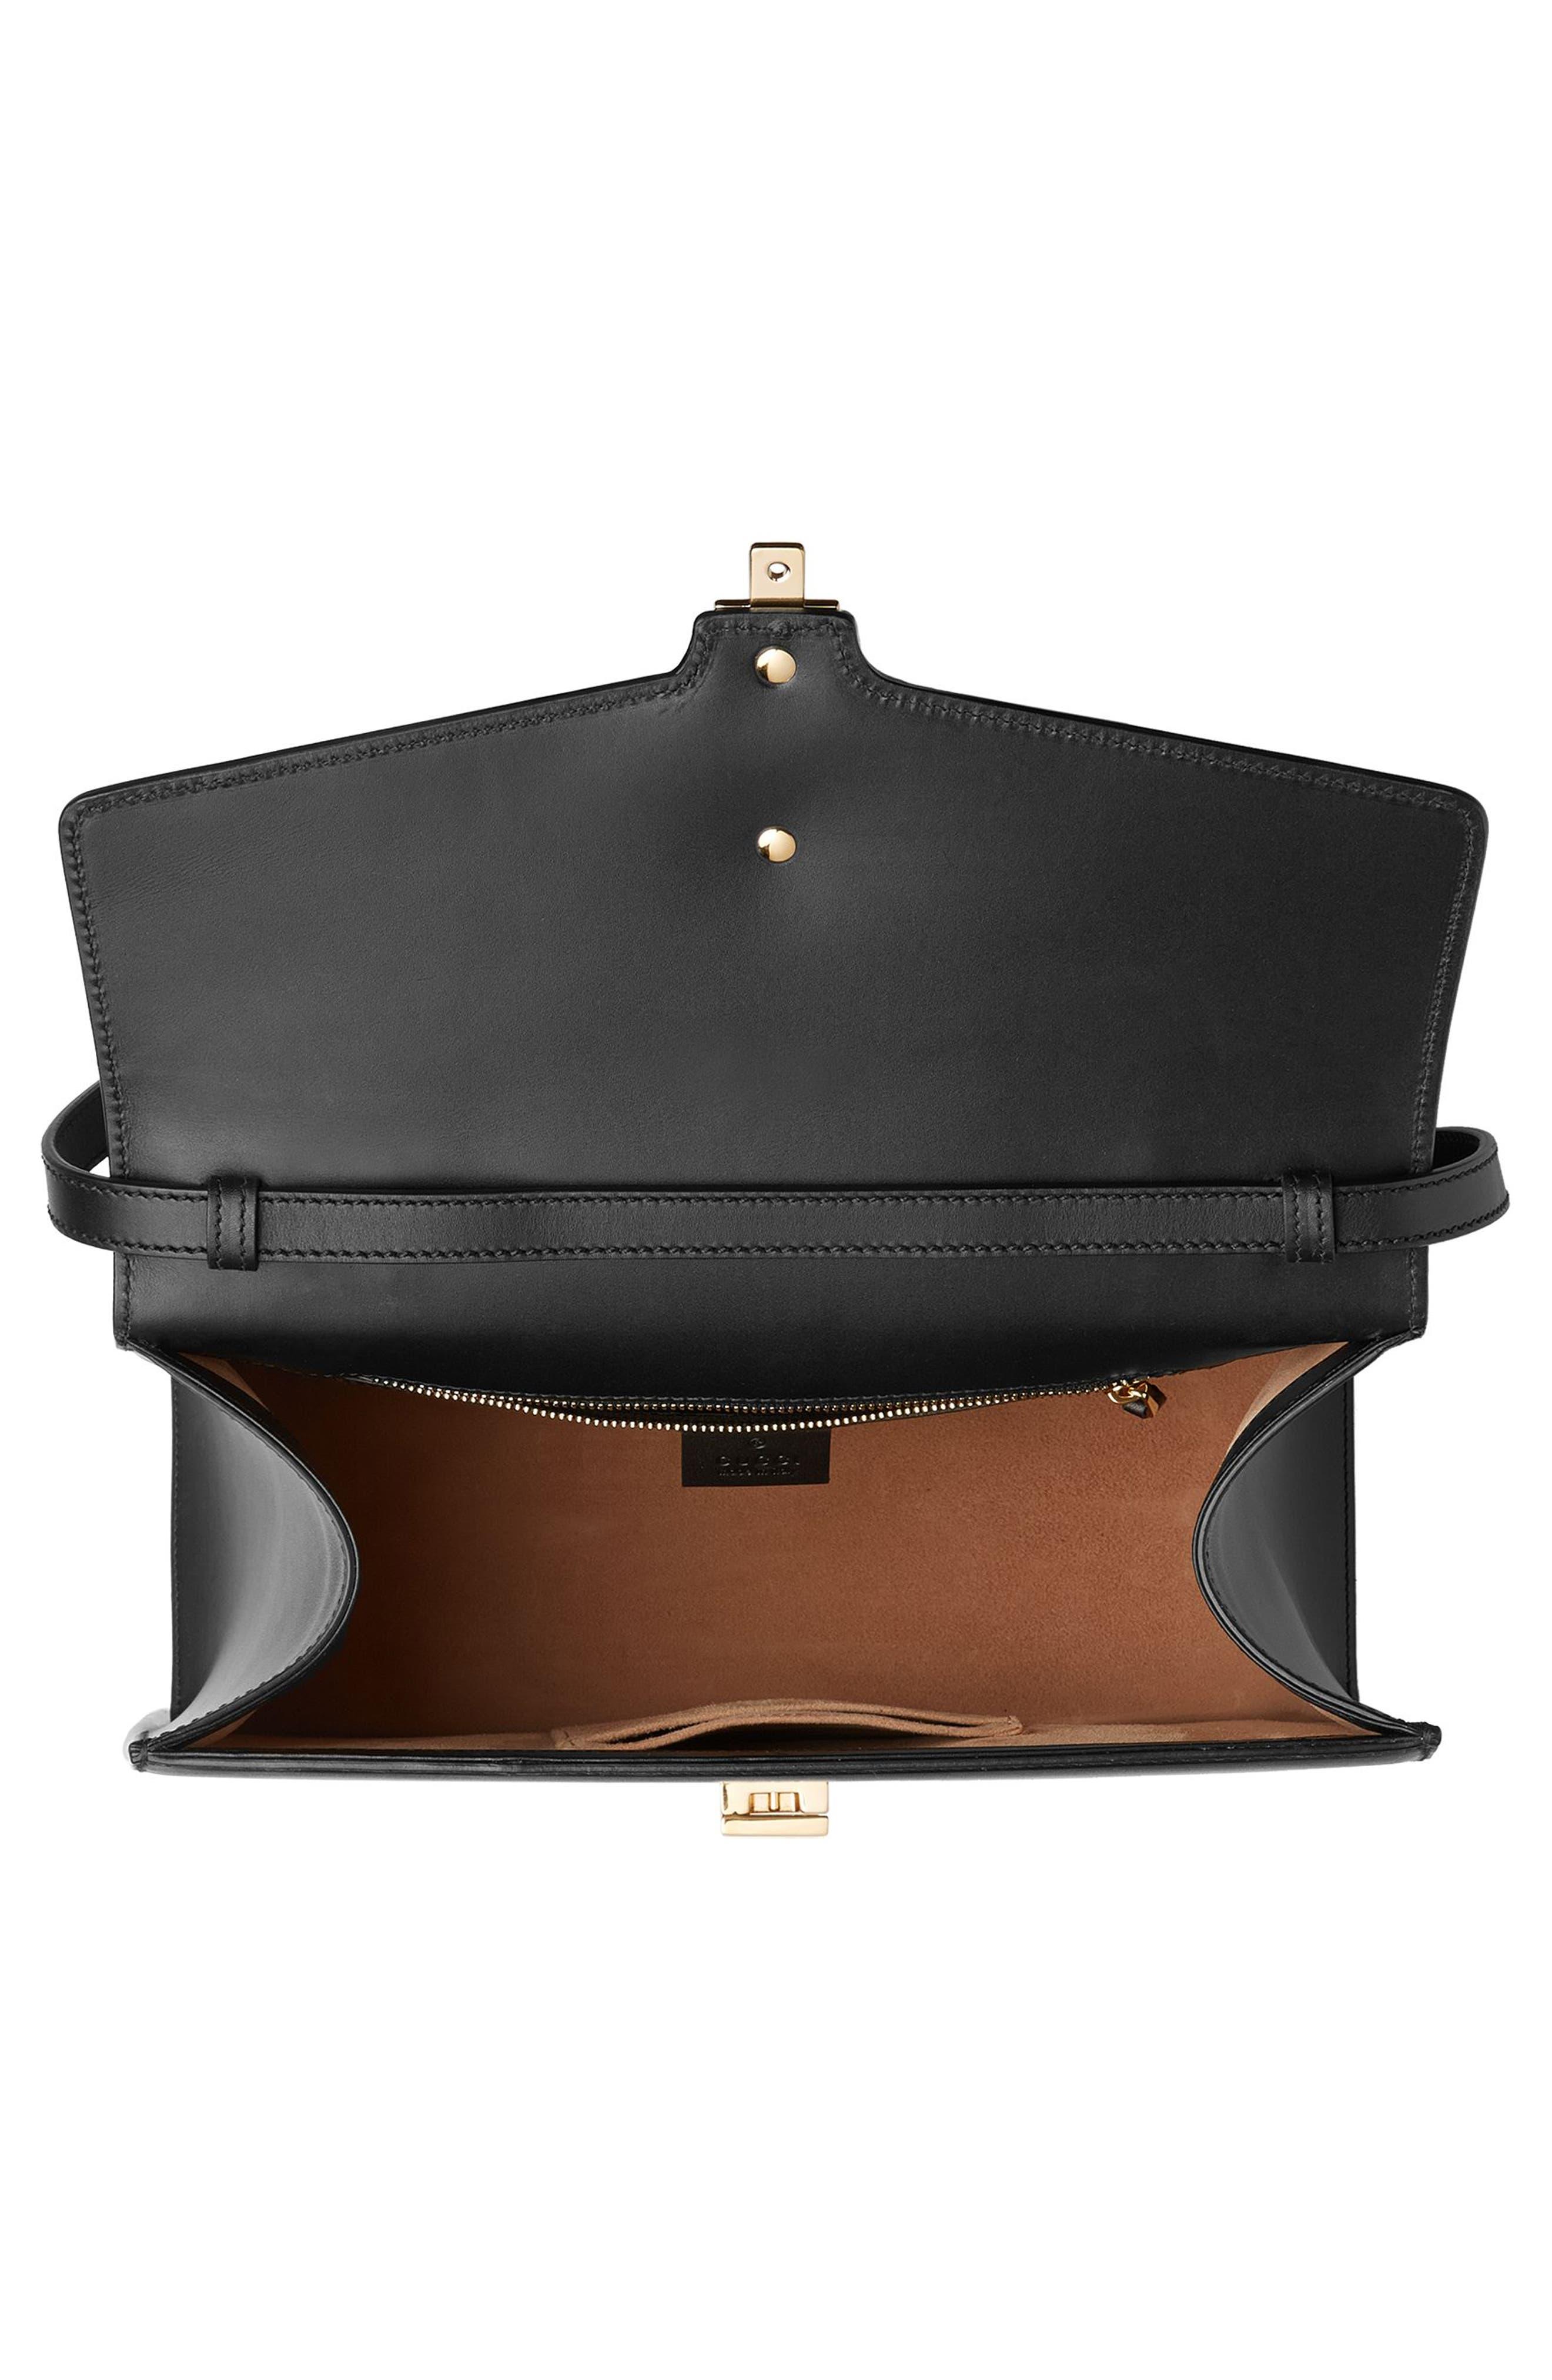 Sylvie Top Handle Leather Shoulder Bag,                             Alternate thumbnail 3, color,                             NERO/VRV